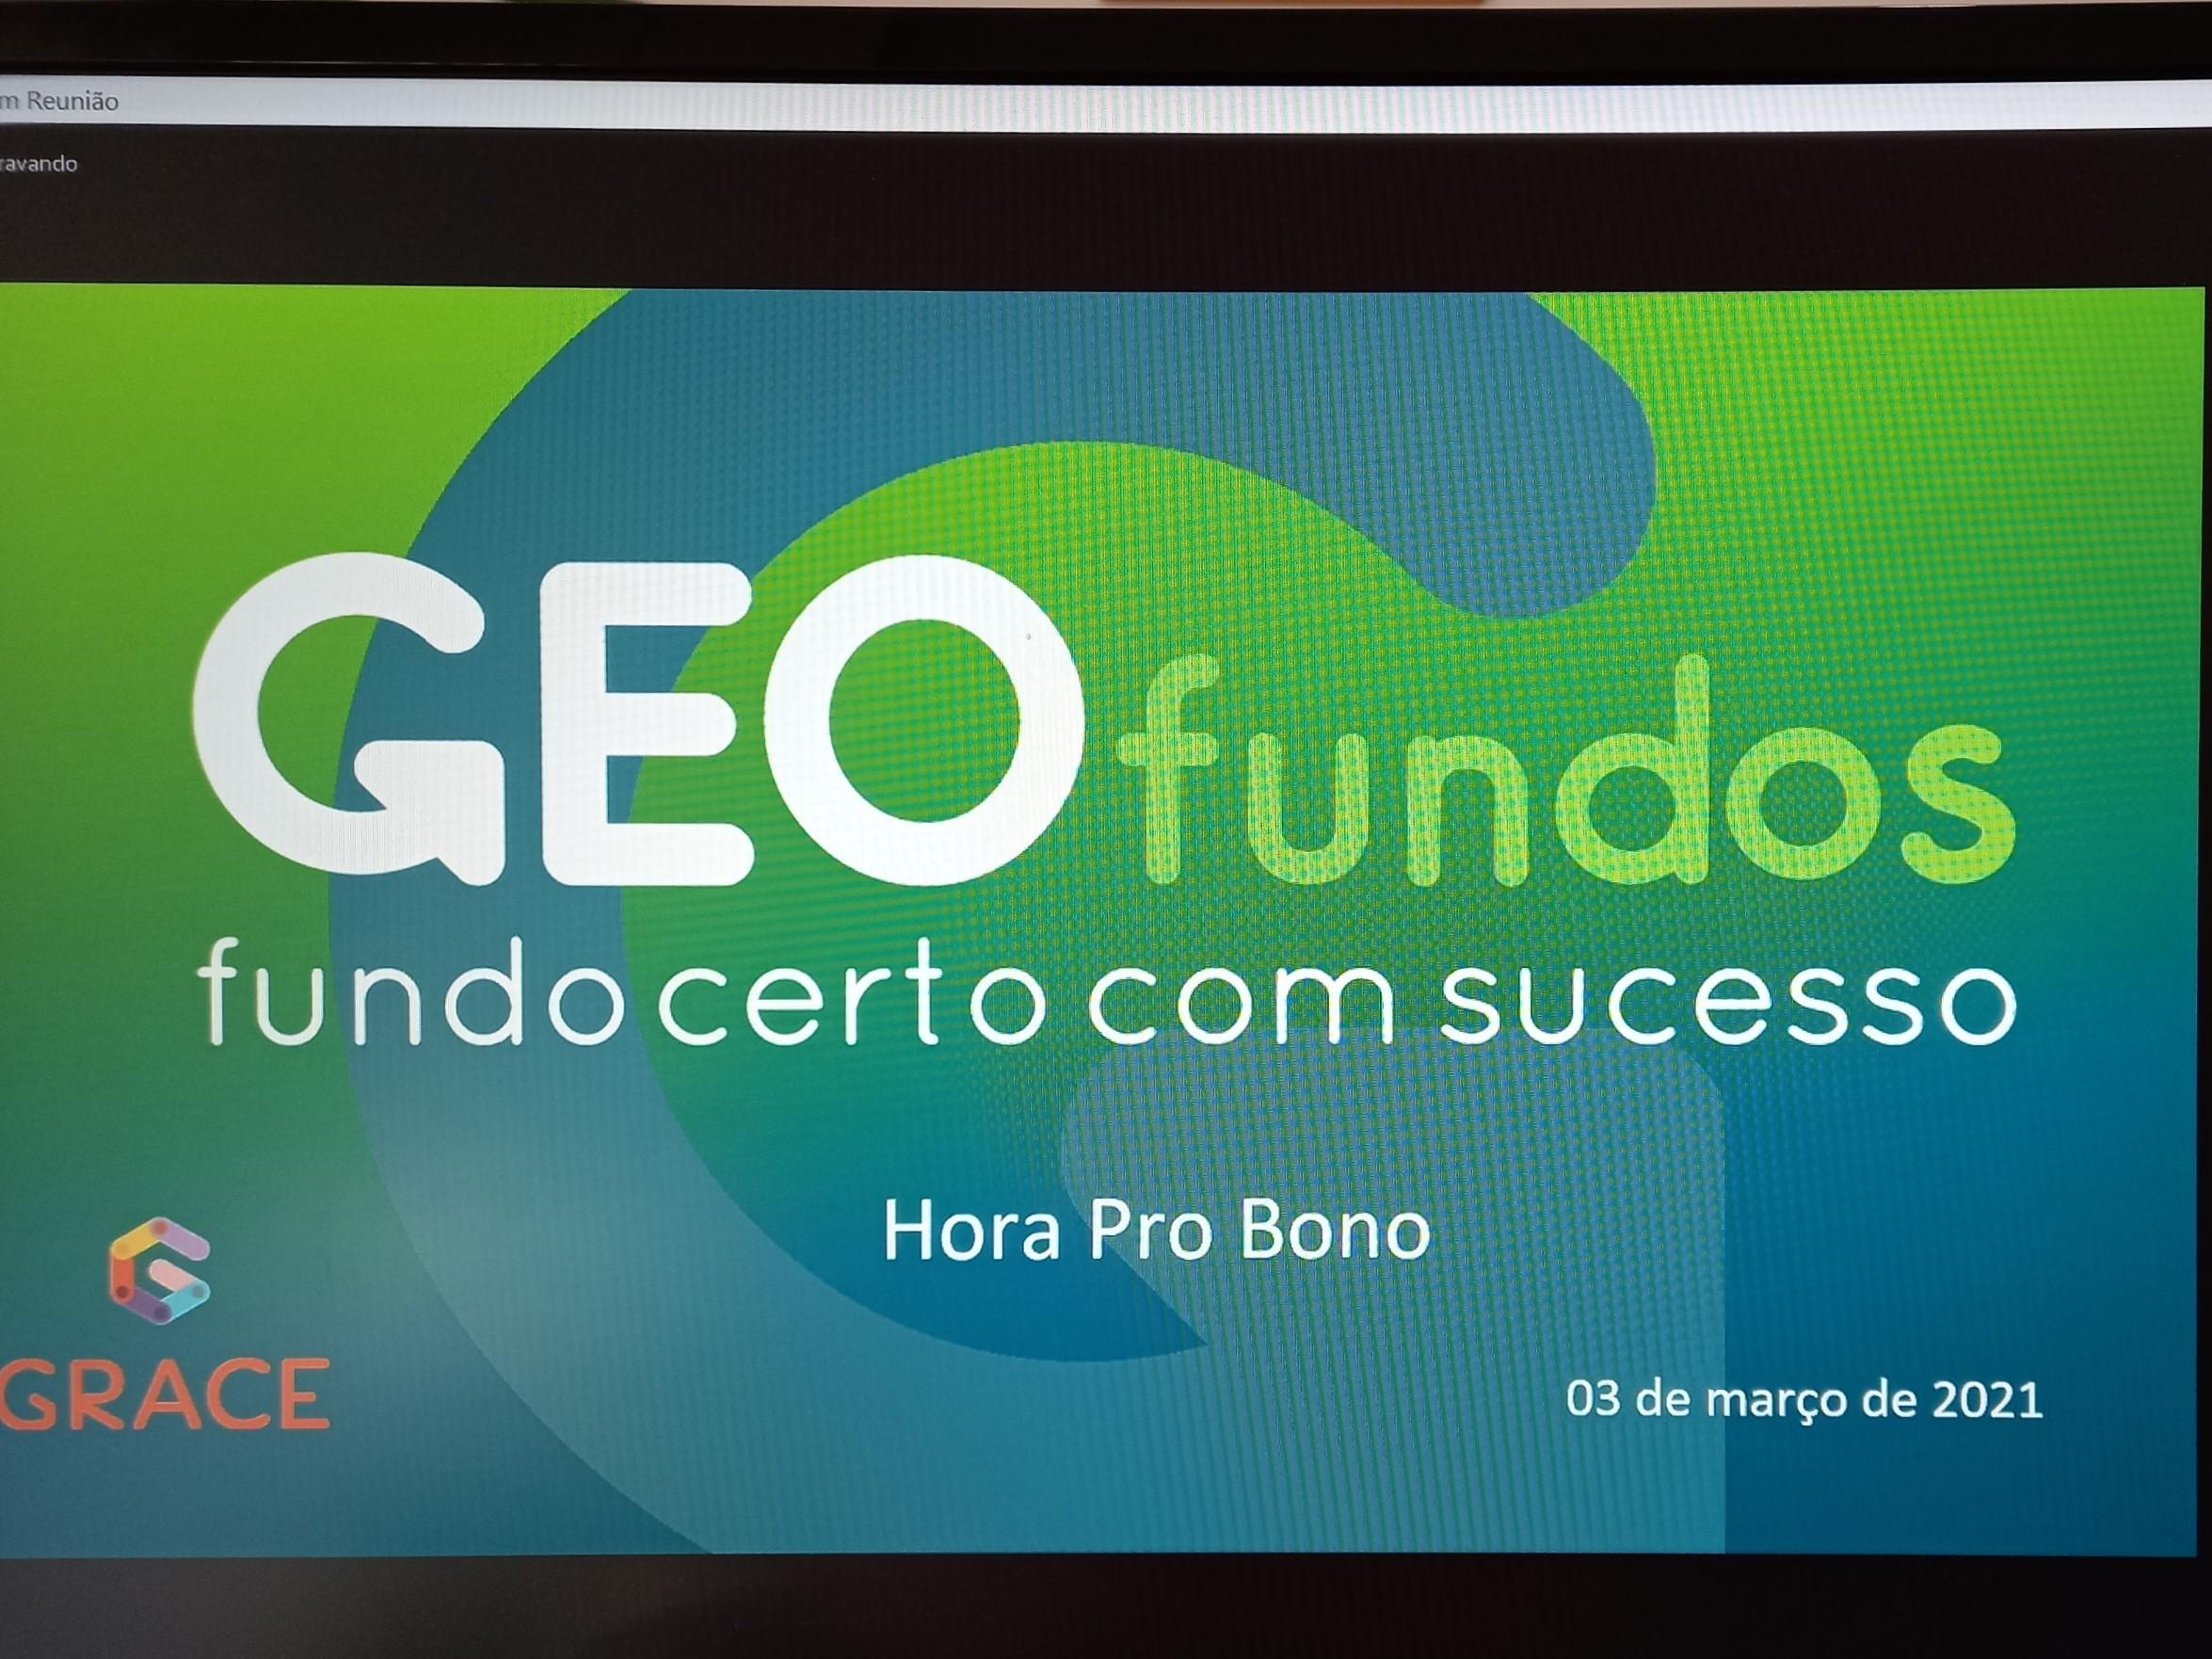 Hora Pro Bono GRACE – conheça a GEOfundos